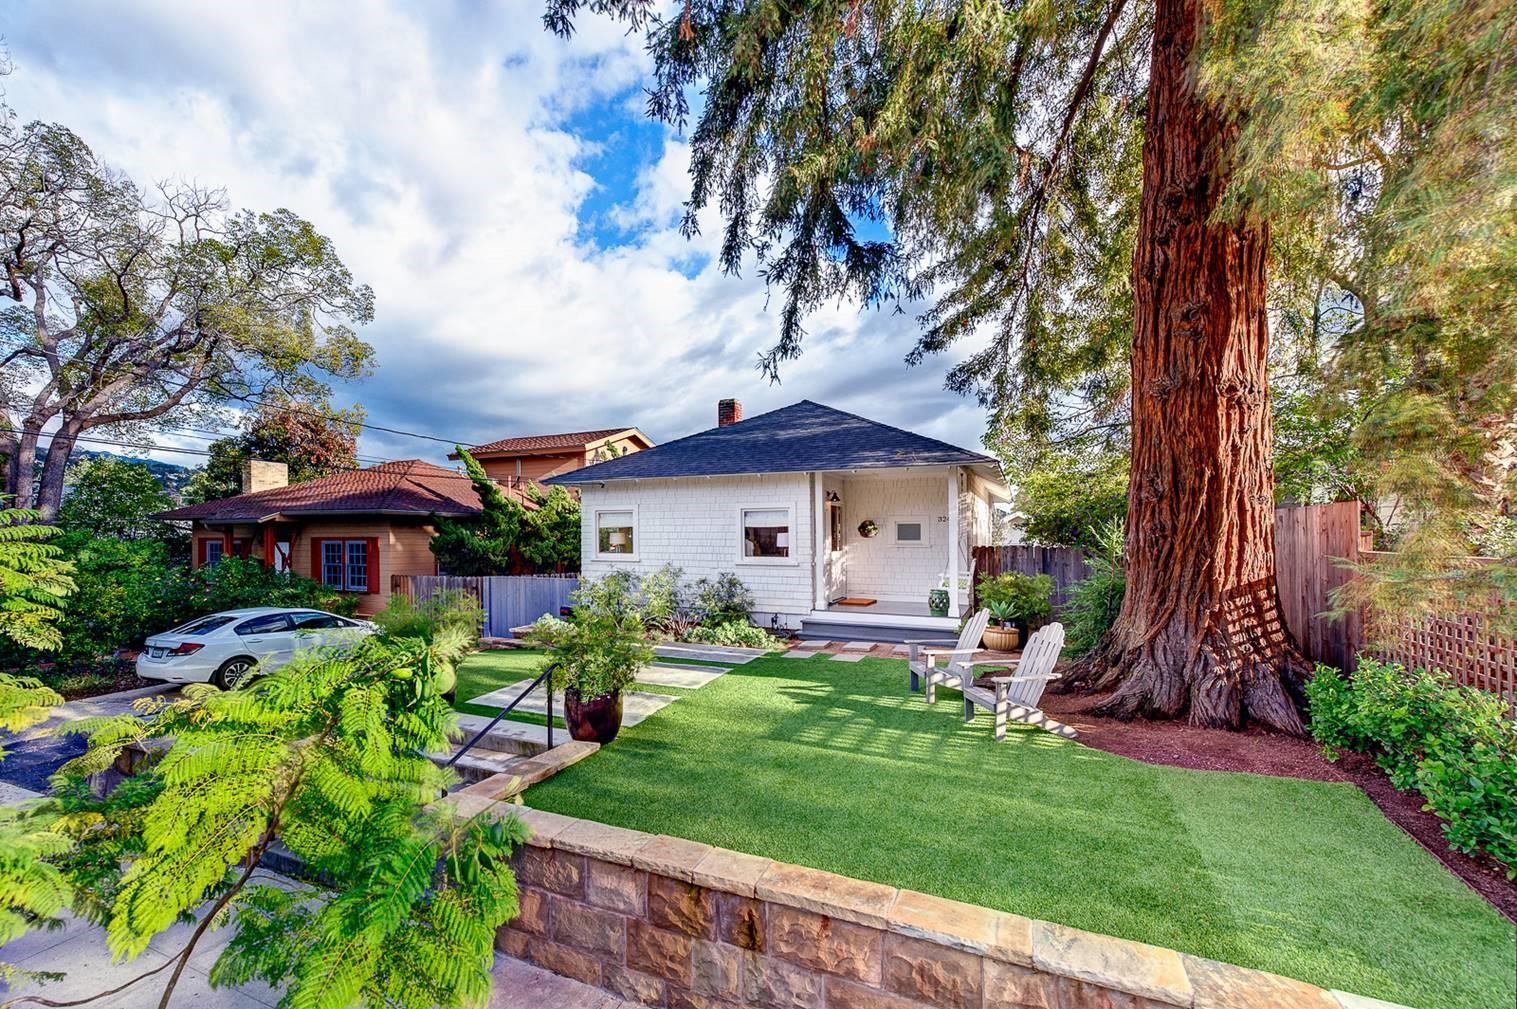 Property photo for 324 E Valerio St Santa Barbara, California 93101 - 17-209